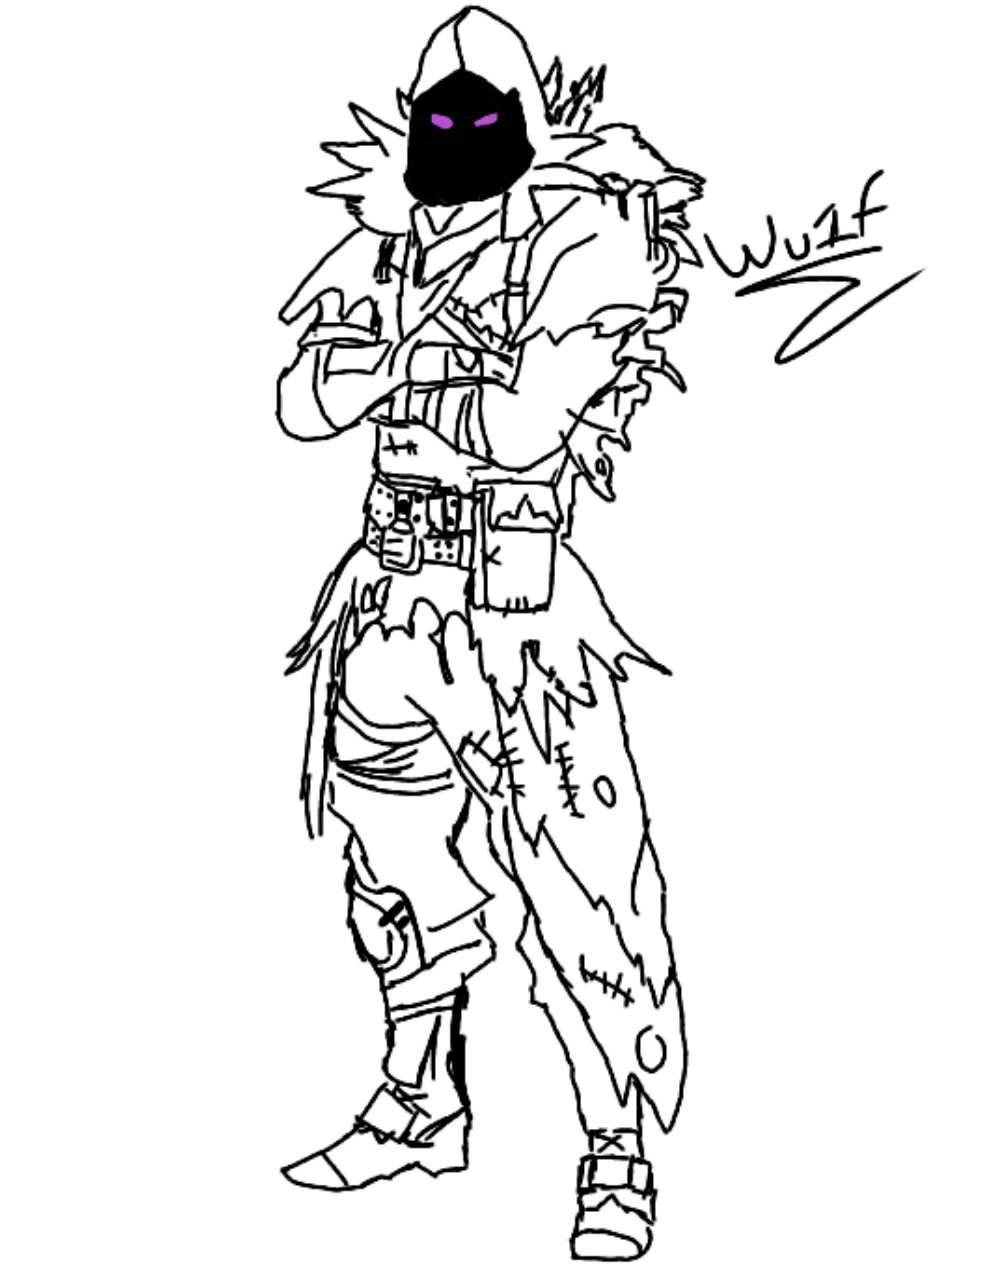 Raven WOOOOOOOOW  Fortnite: Battle Royale Armory Amino